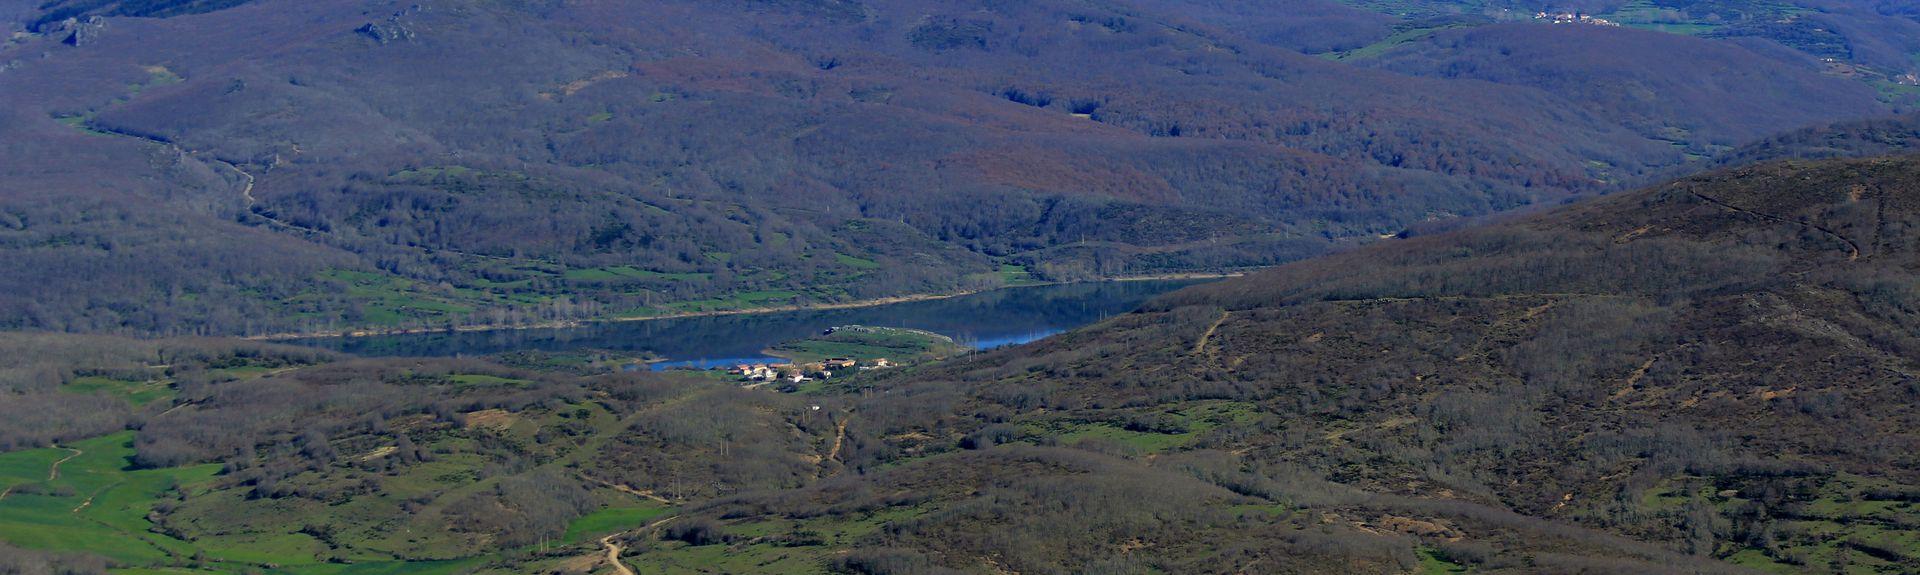 Salinas de Pisuerga, Castilla y León, España